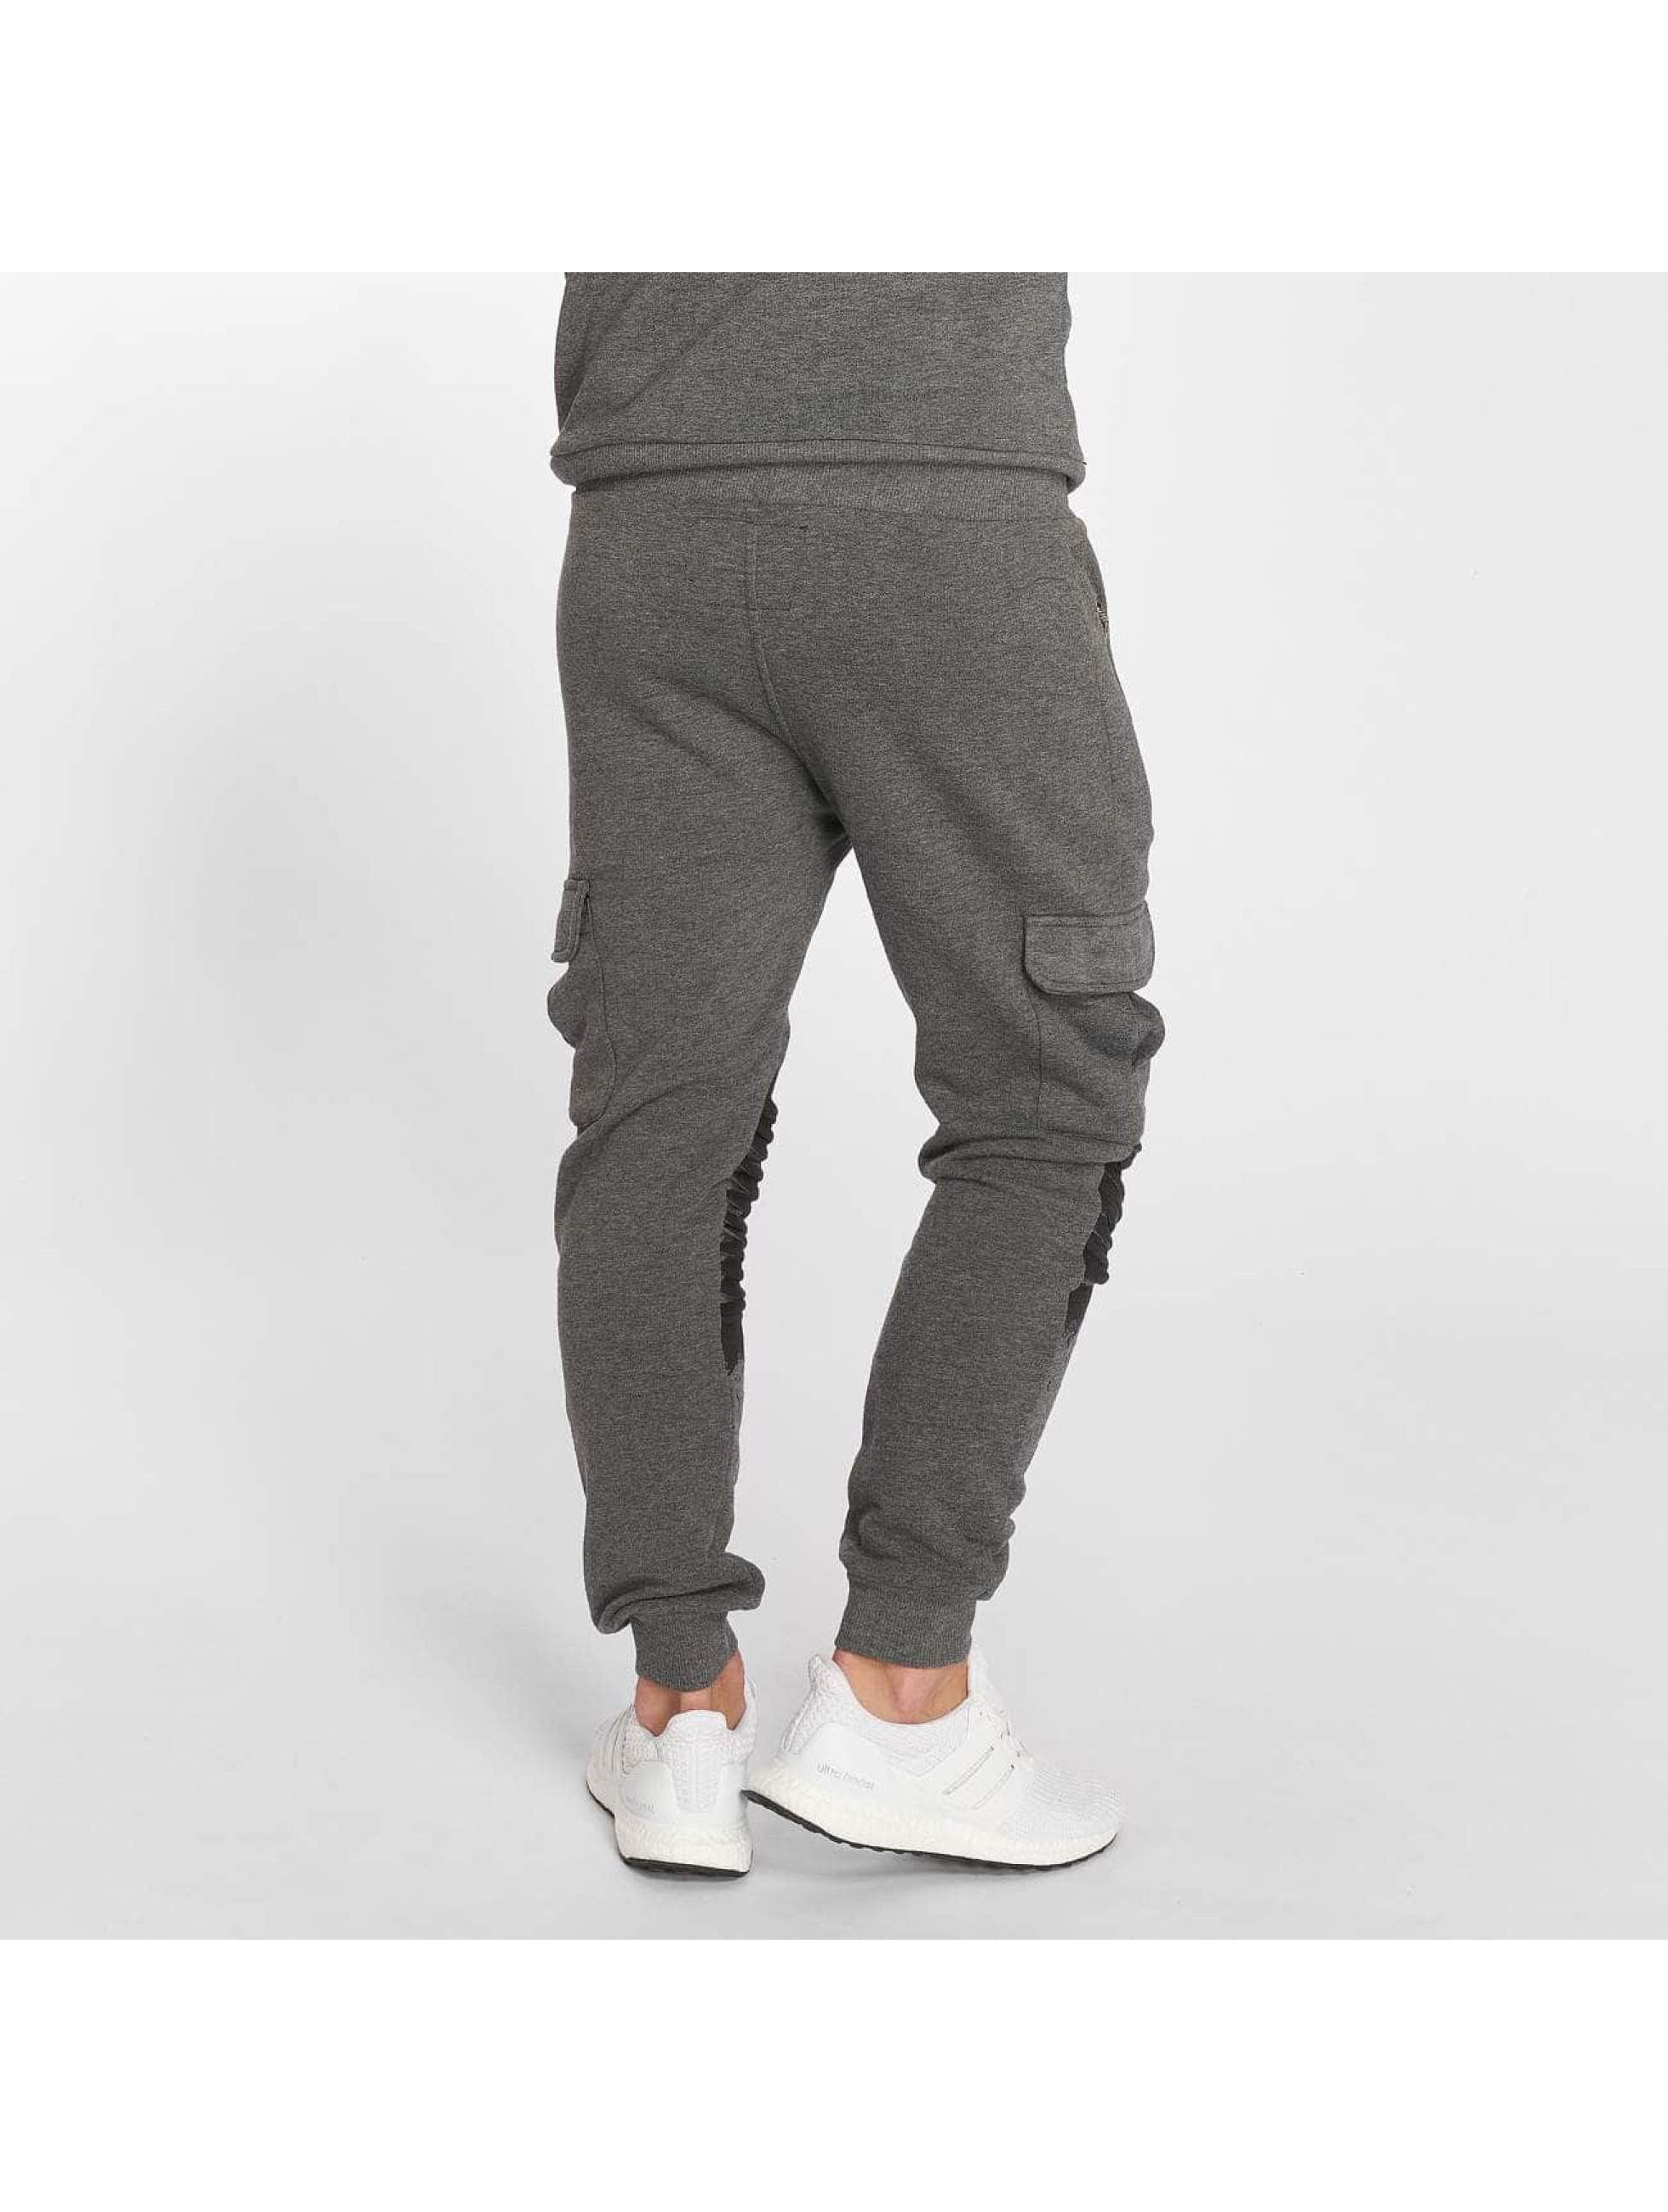 VSCT Clubwear tepláky Cargo Oiled šedá